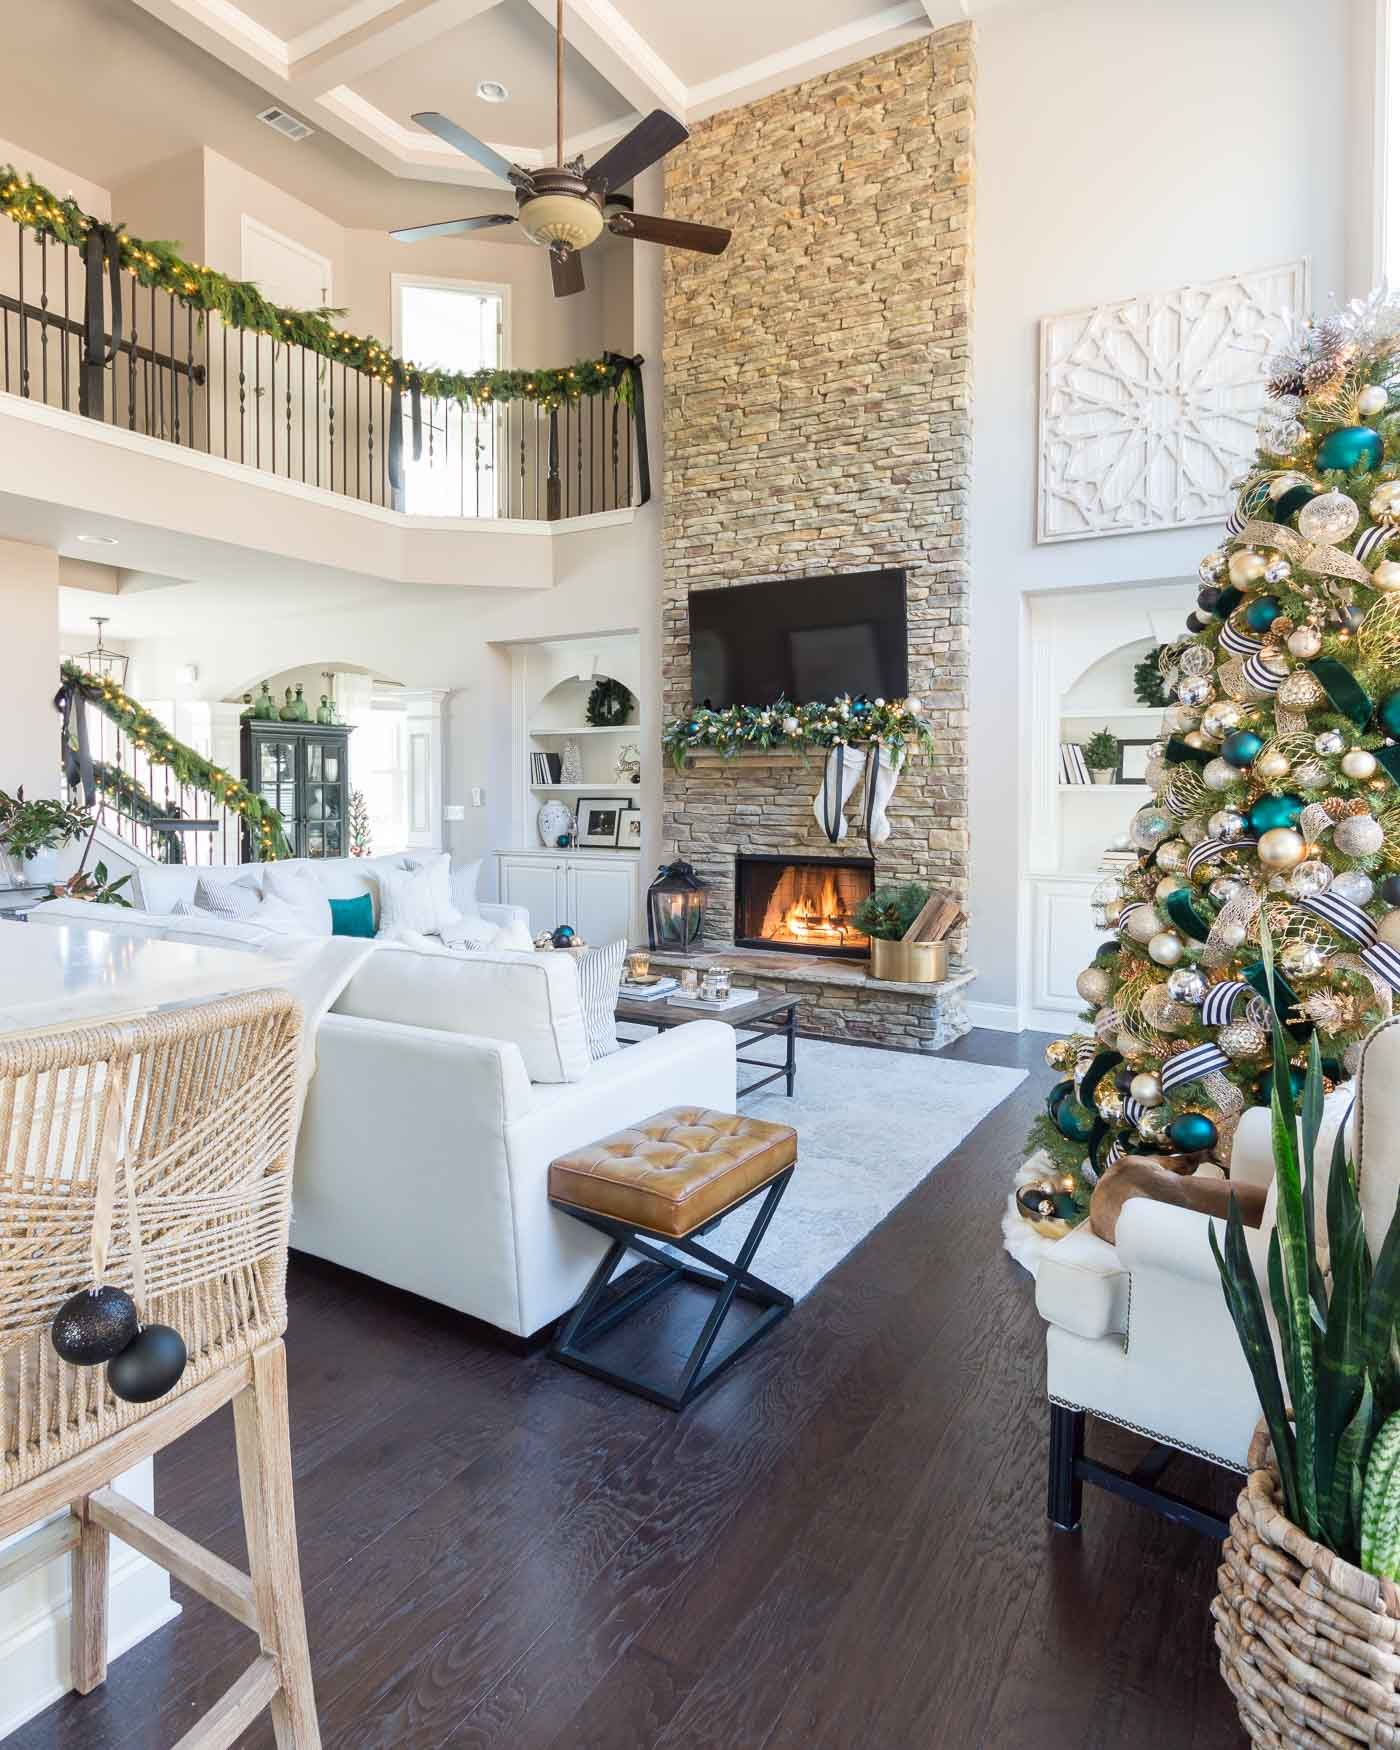 Christmas Home Tour, Holiday Decorations, and Unique Color Schemes